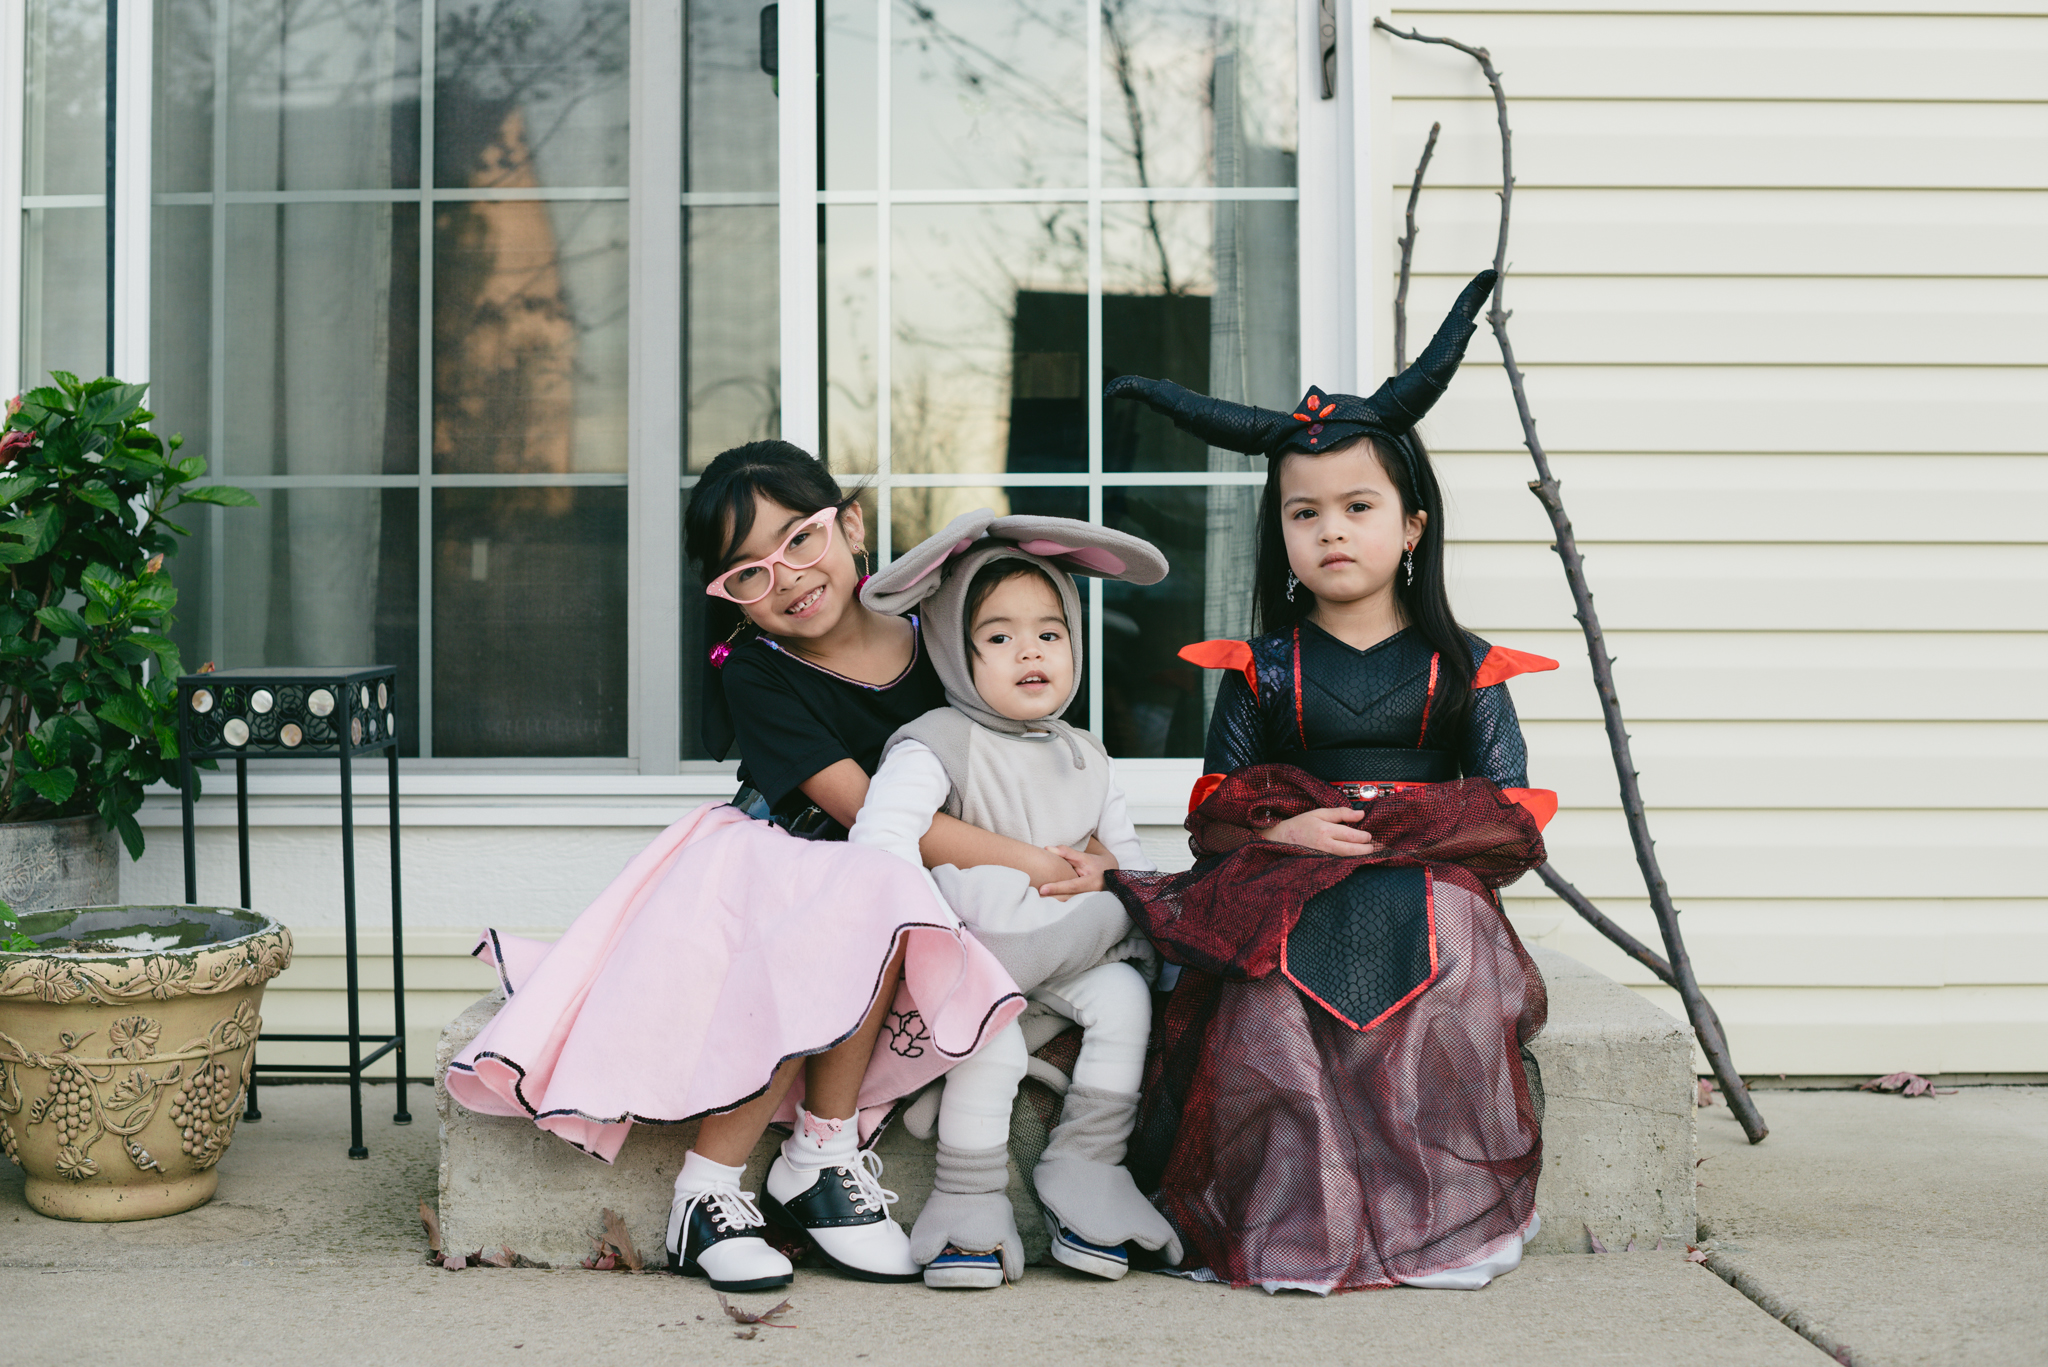 20141026-Halloween 2014-015-FBEdit.JPG